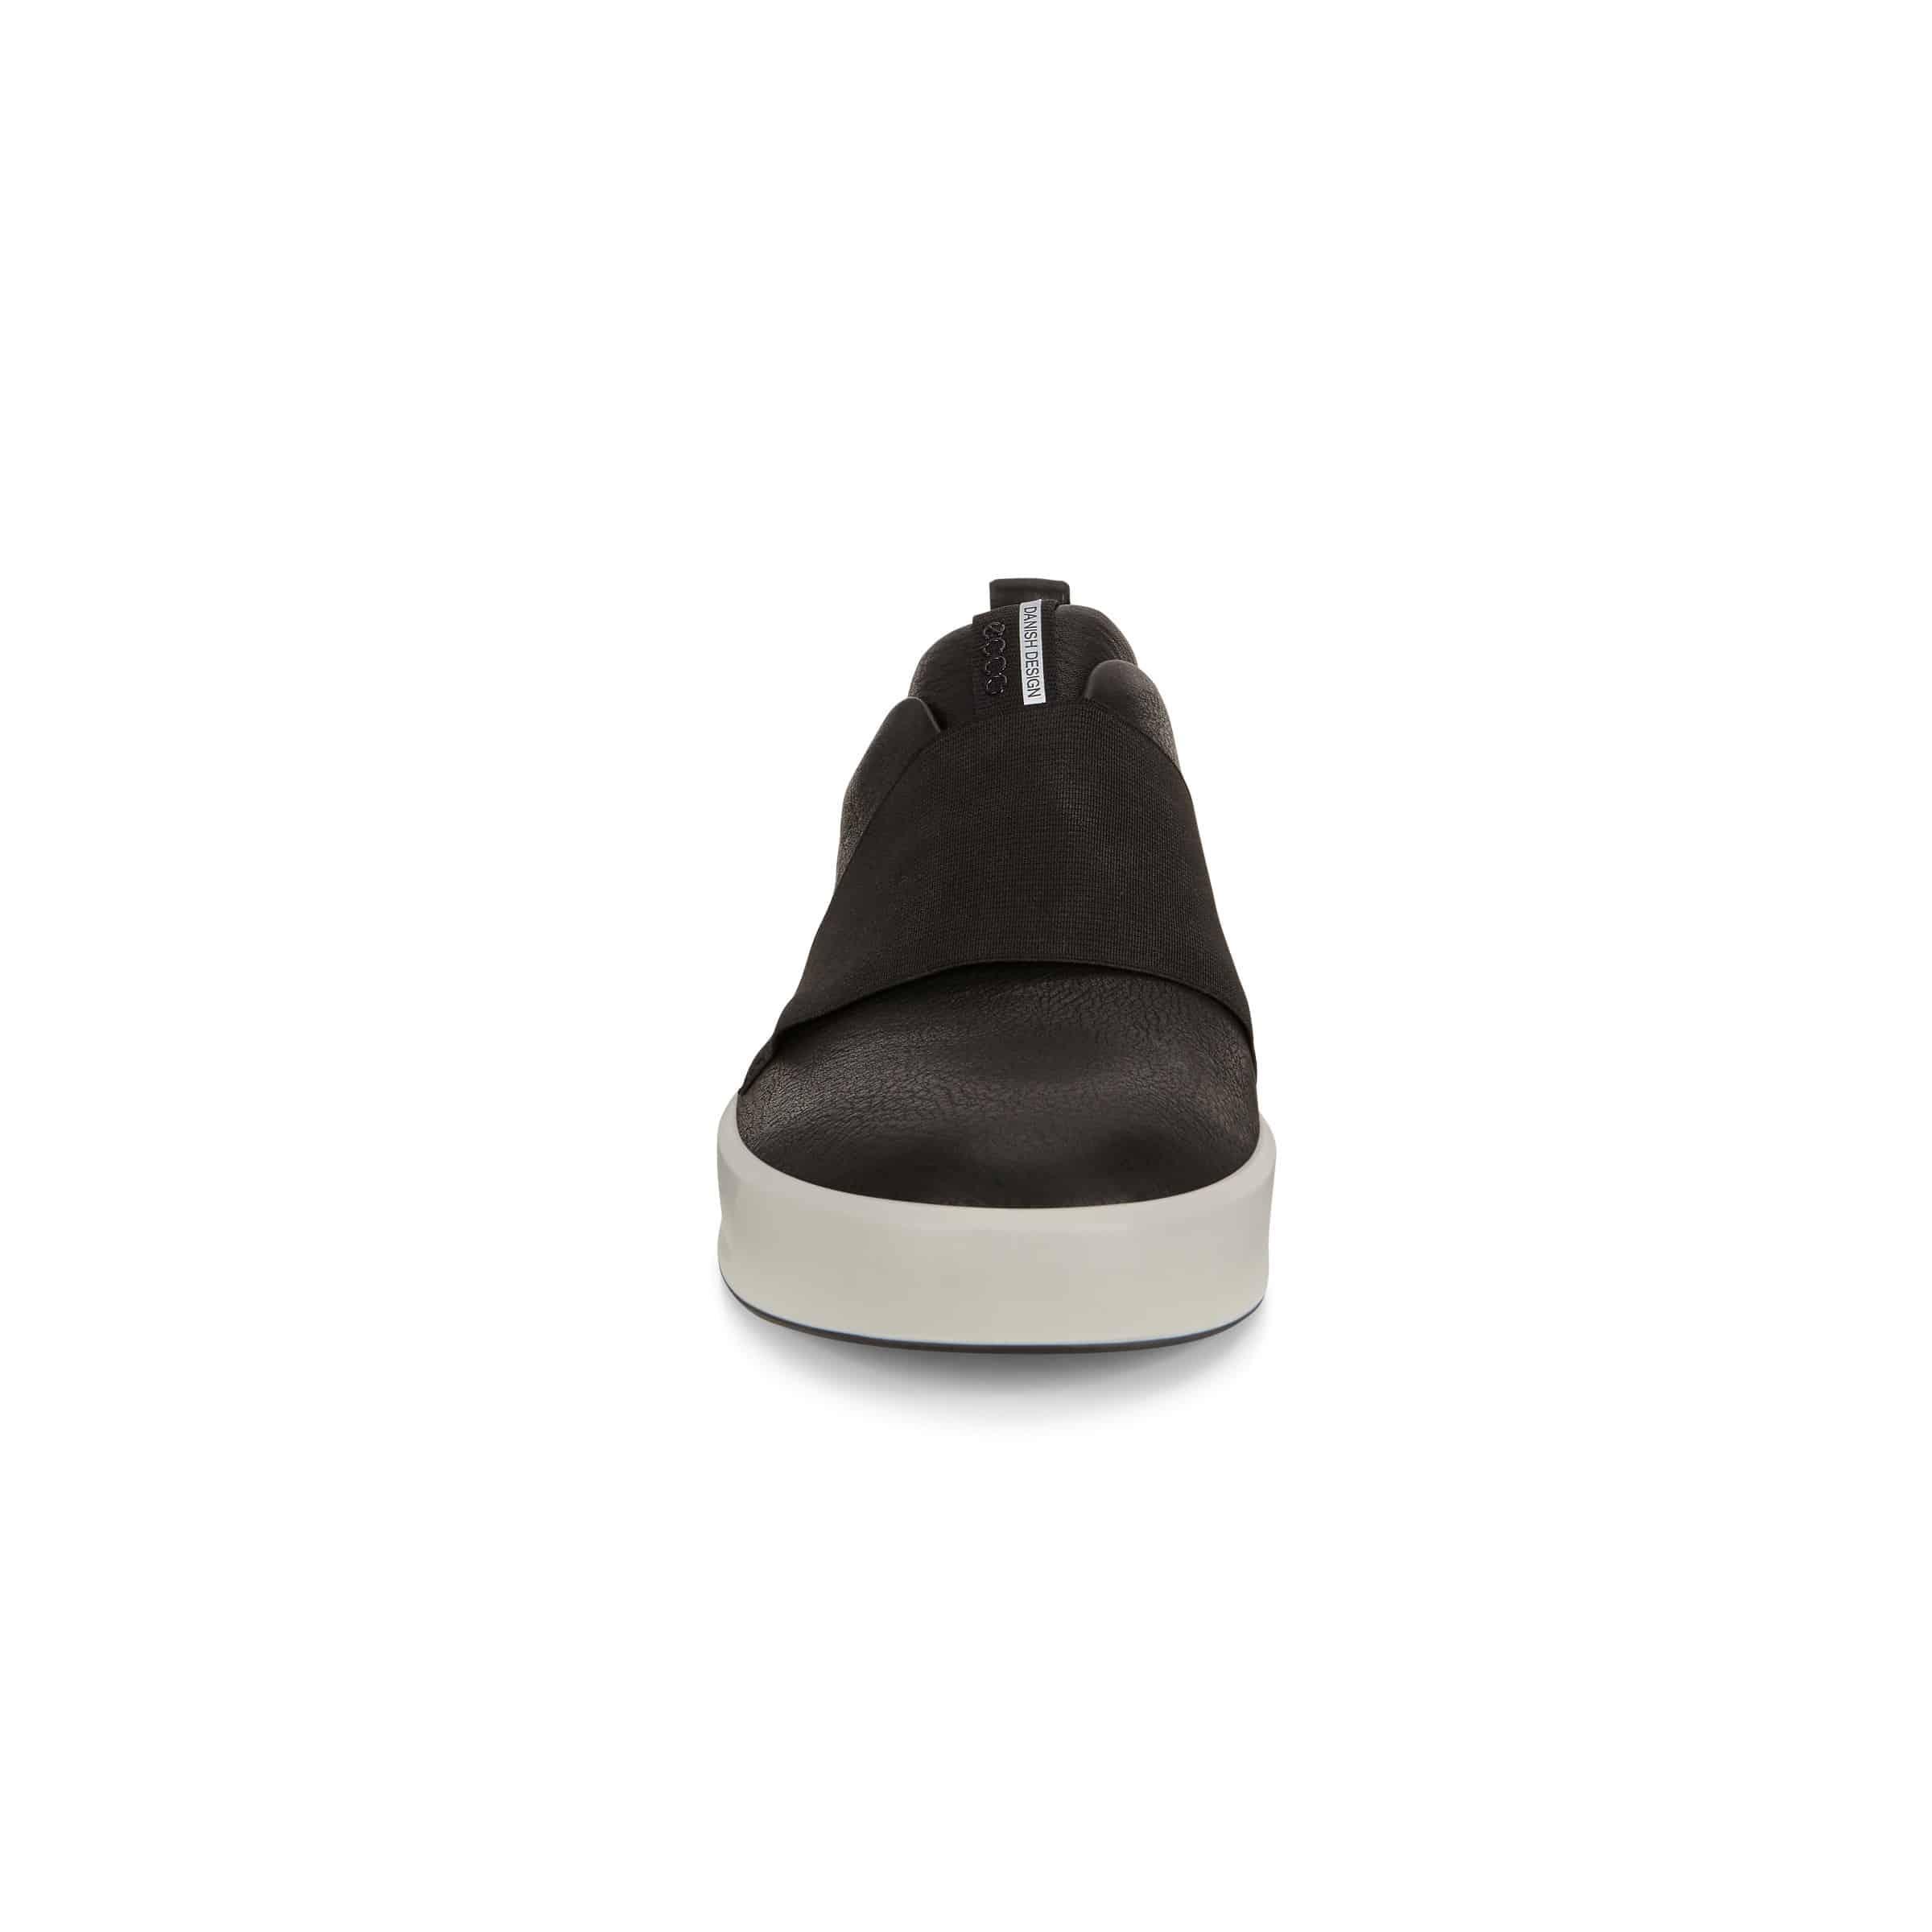 9c23bac45 ECCO SOFT 8 - 121 Shoes